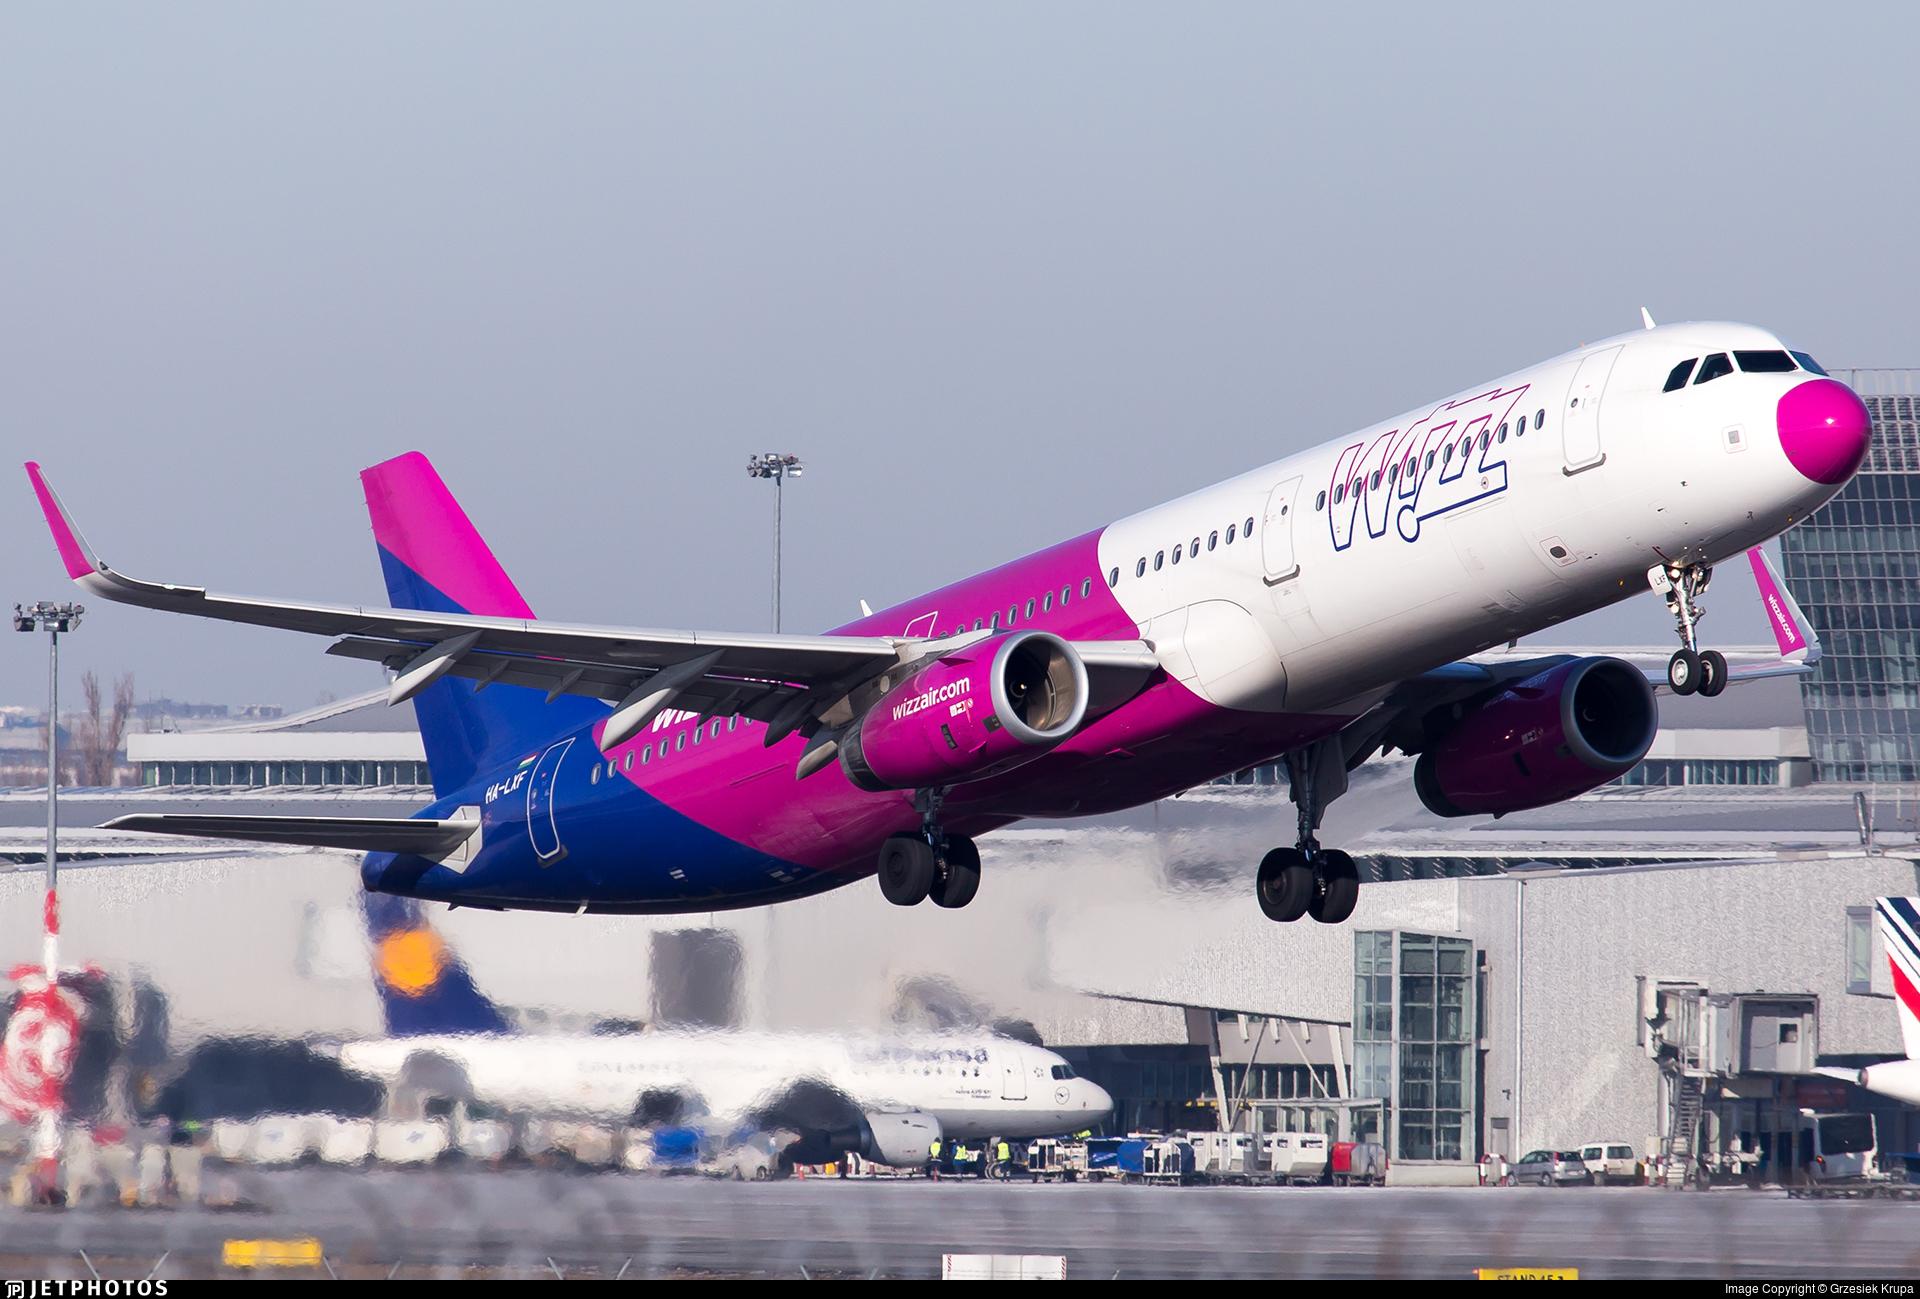 Ha Lxf Airbus A321 231 Wizz Air Grzesiek Krupa Jetphotos